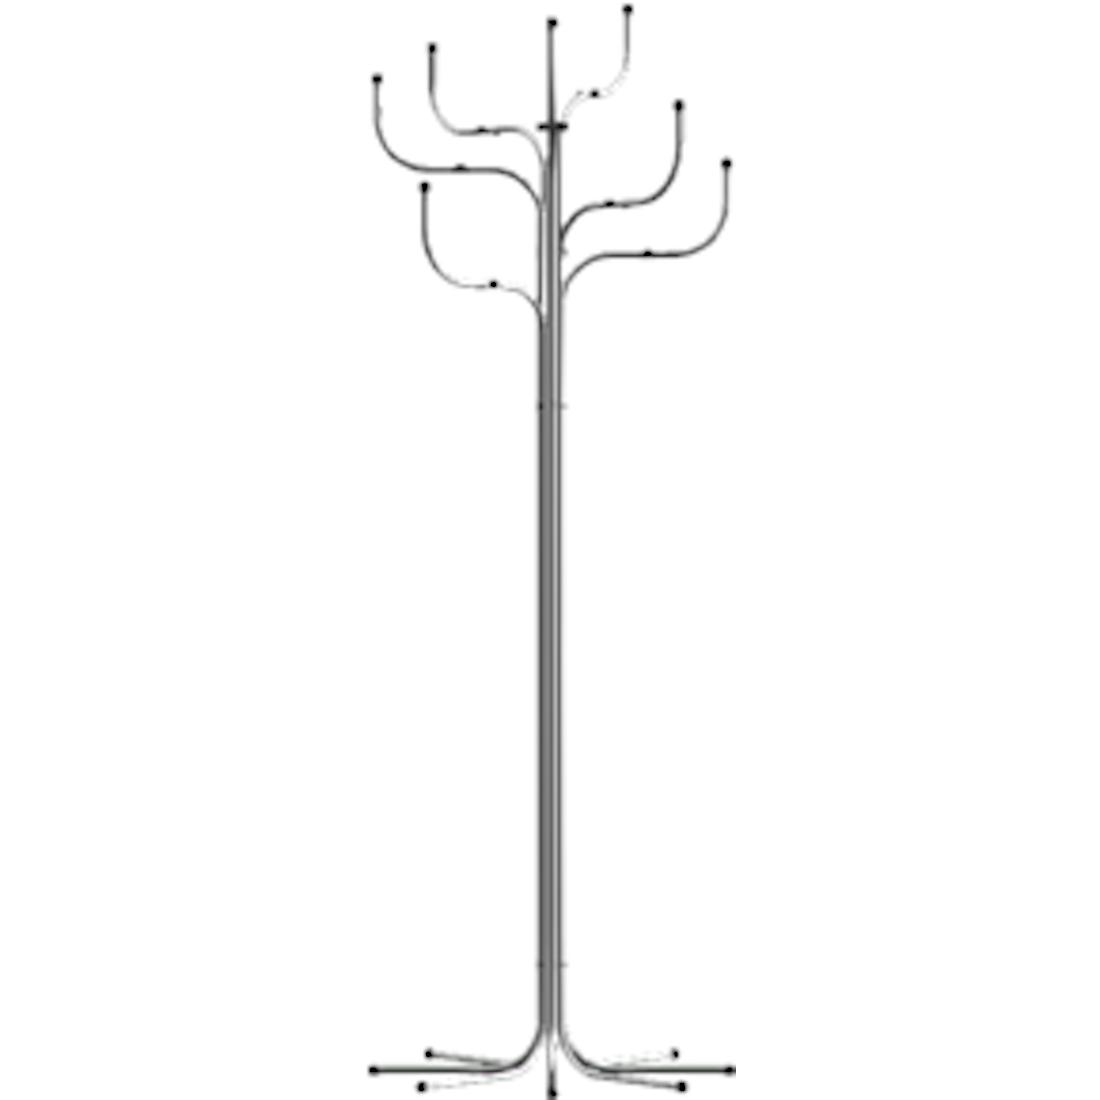 Fritz Hansen Coat Tree stumtjener, Forkromet, Timm Møbler